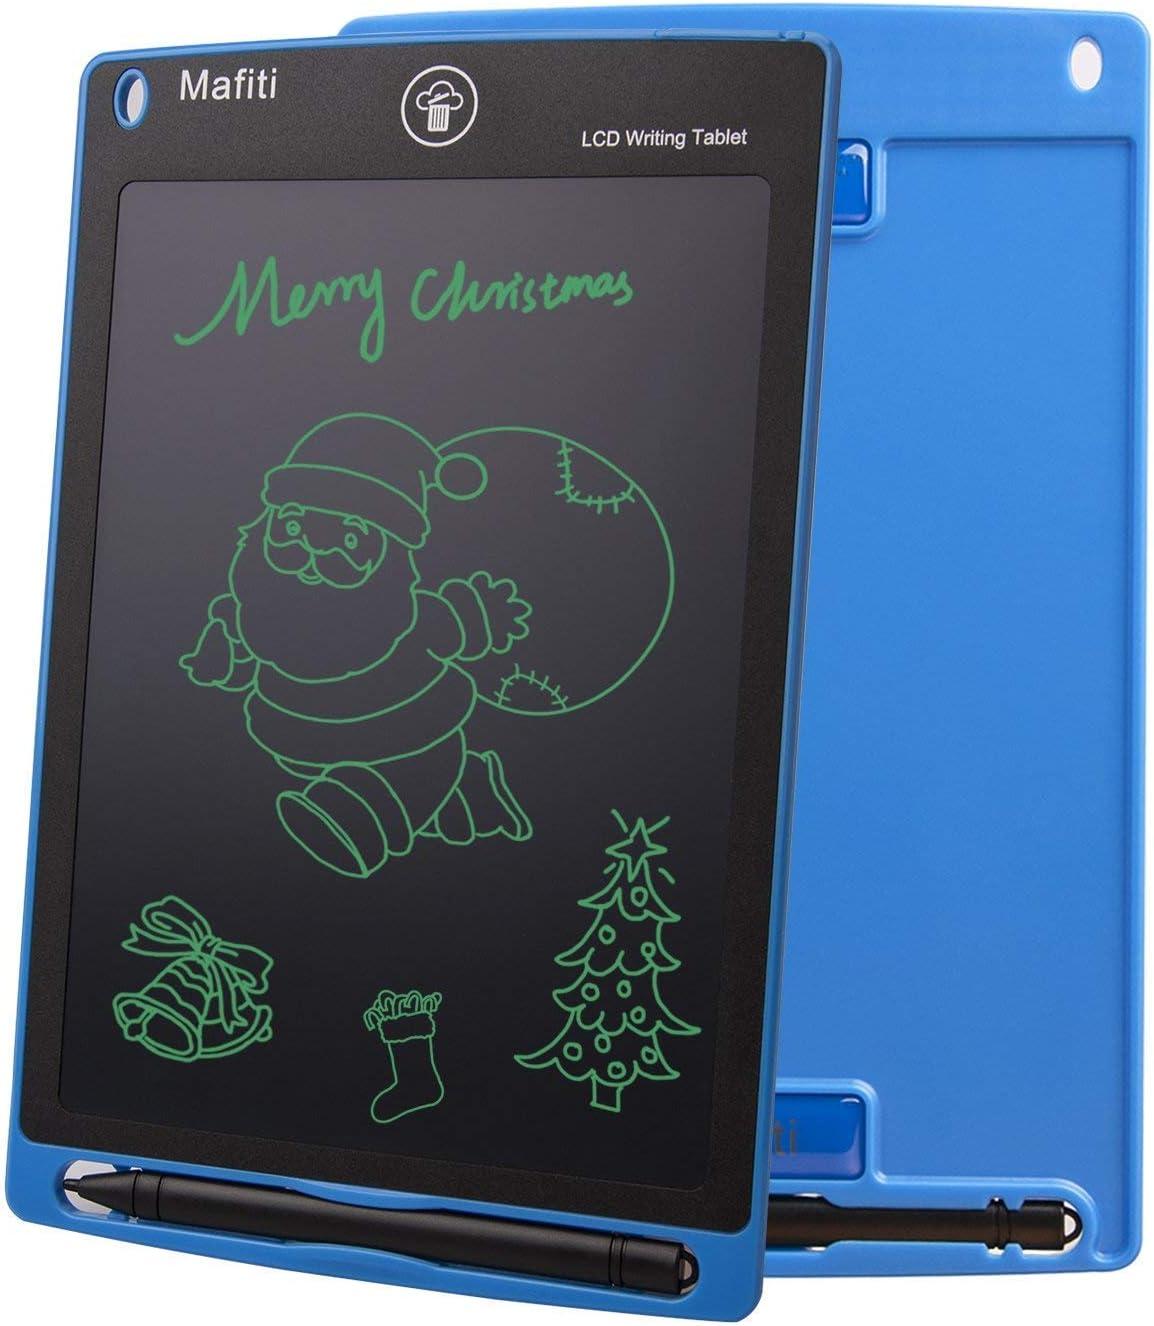 Mafiti 8,5 Pulgadas Tableta Gráfica, Tablets de Escritura LCD, Portátil Tableta de Dibujo Adecuada para el hogar, Escuela, Oficina, (Blue)